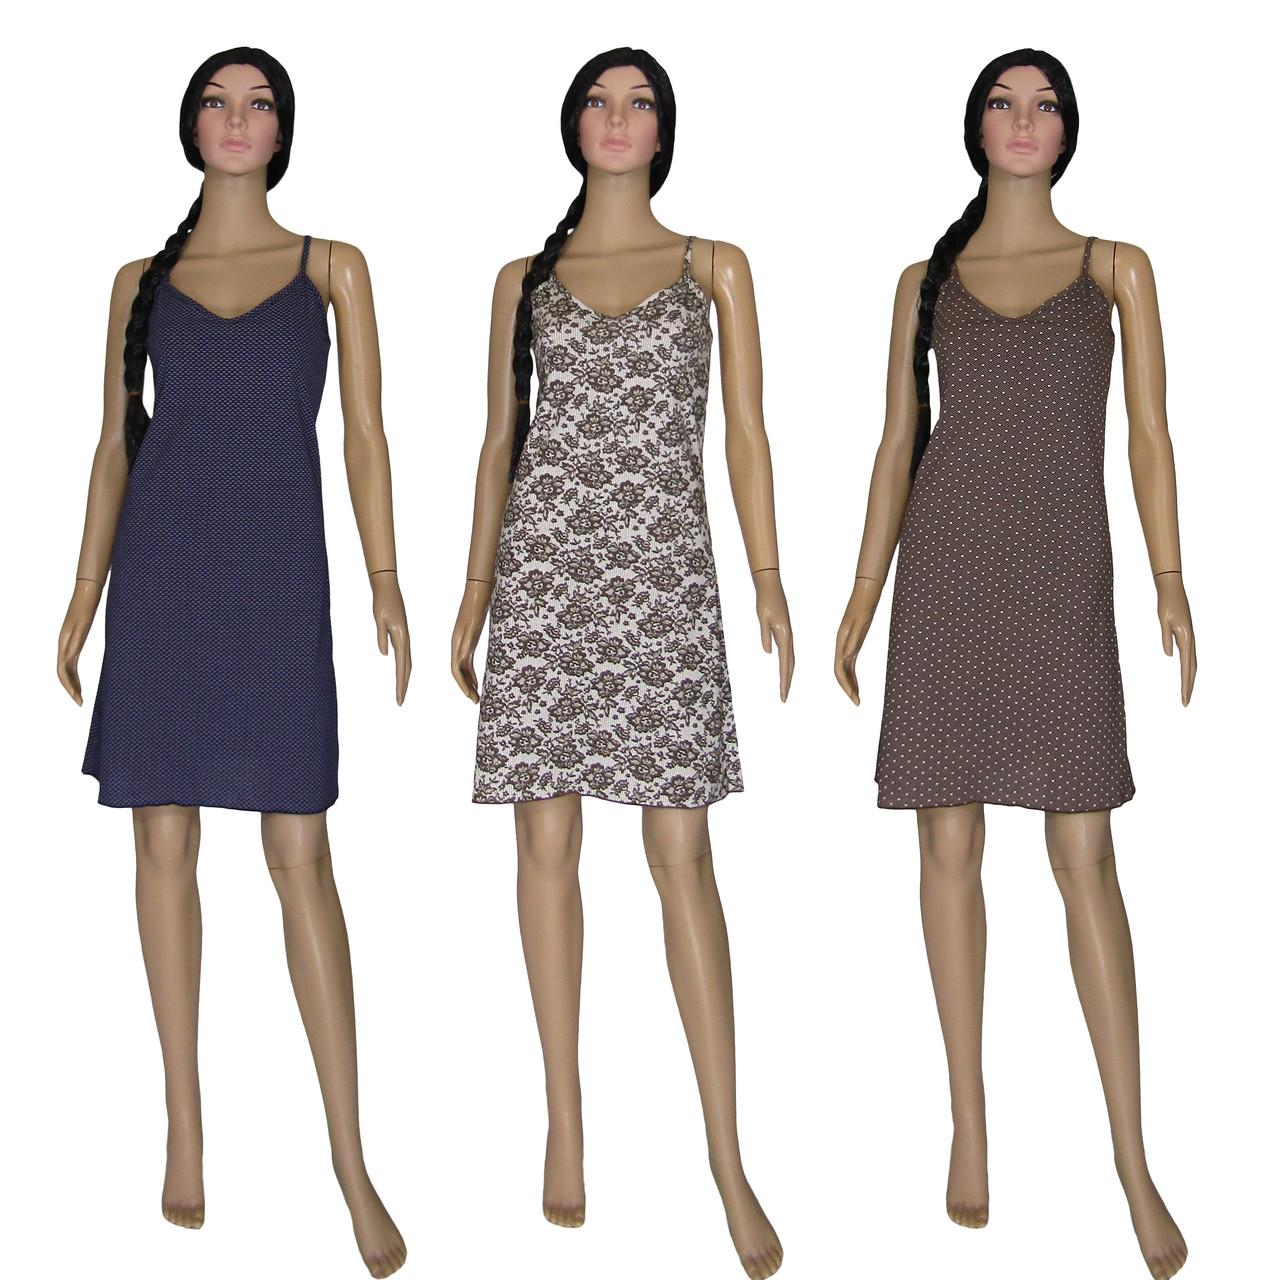 9d1139ae9a31a71 Ночная рубашка женская 03226 Elena, хлопок, р.р.42-54, цена 165 грн ...